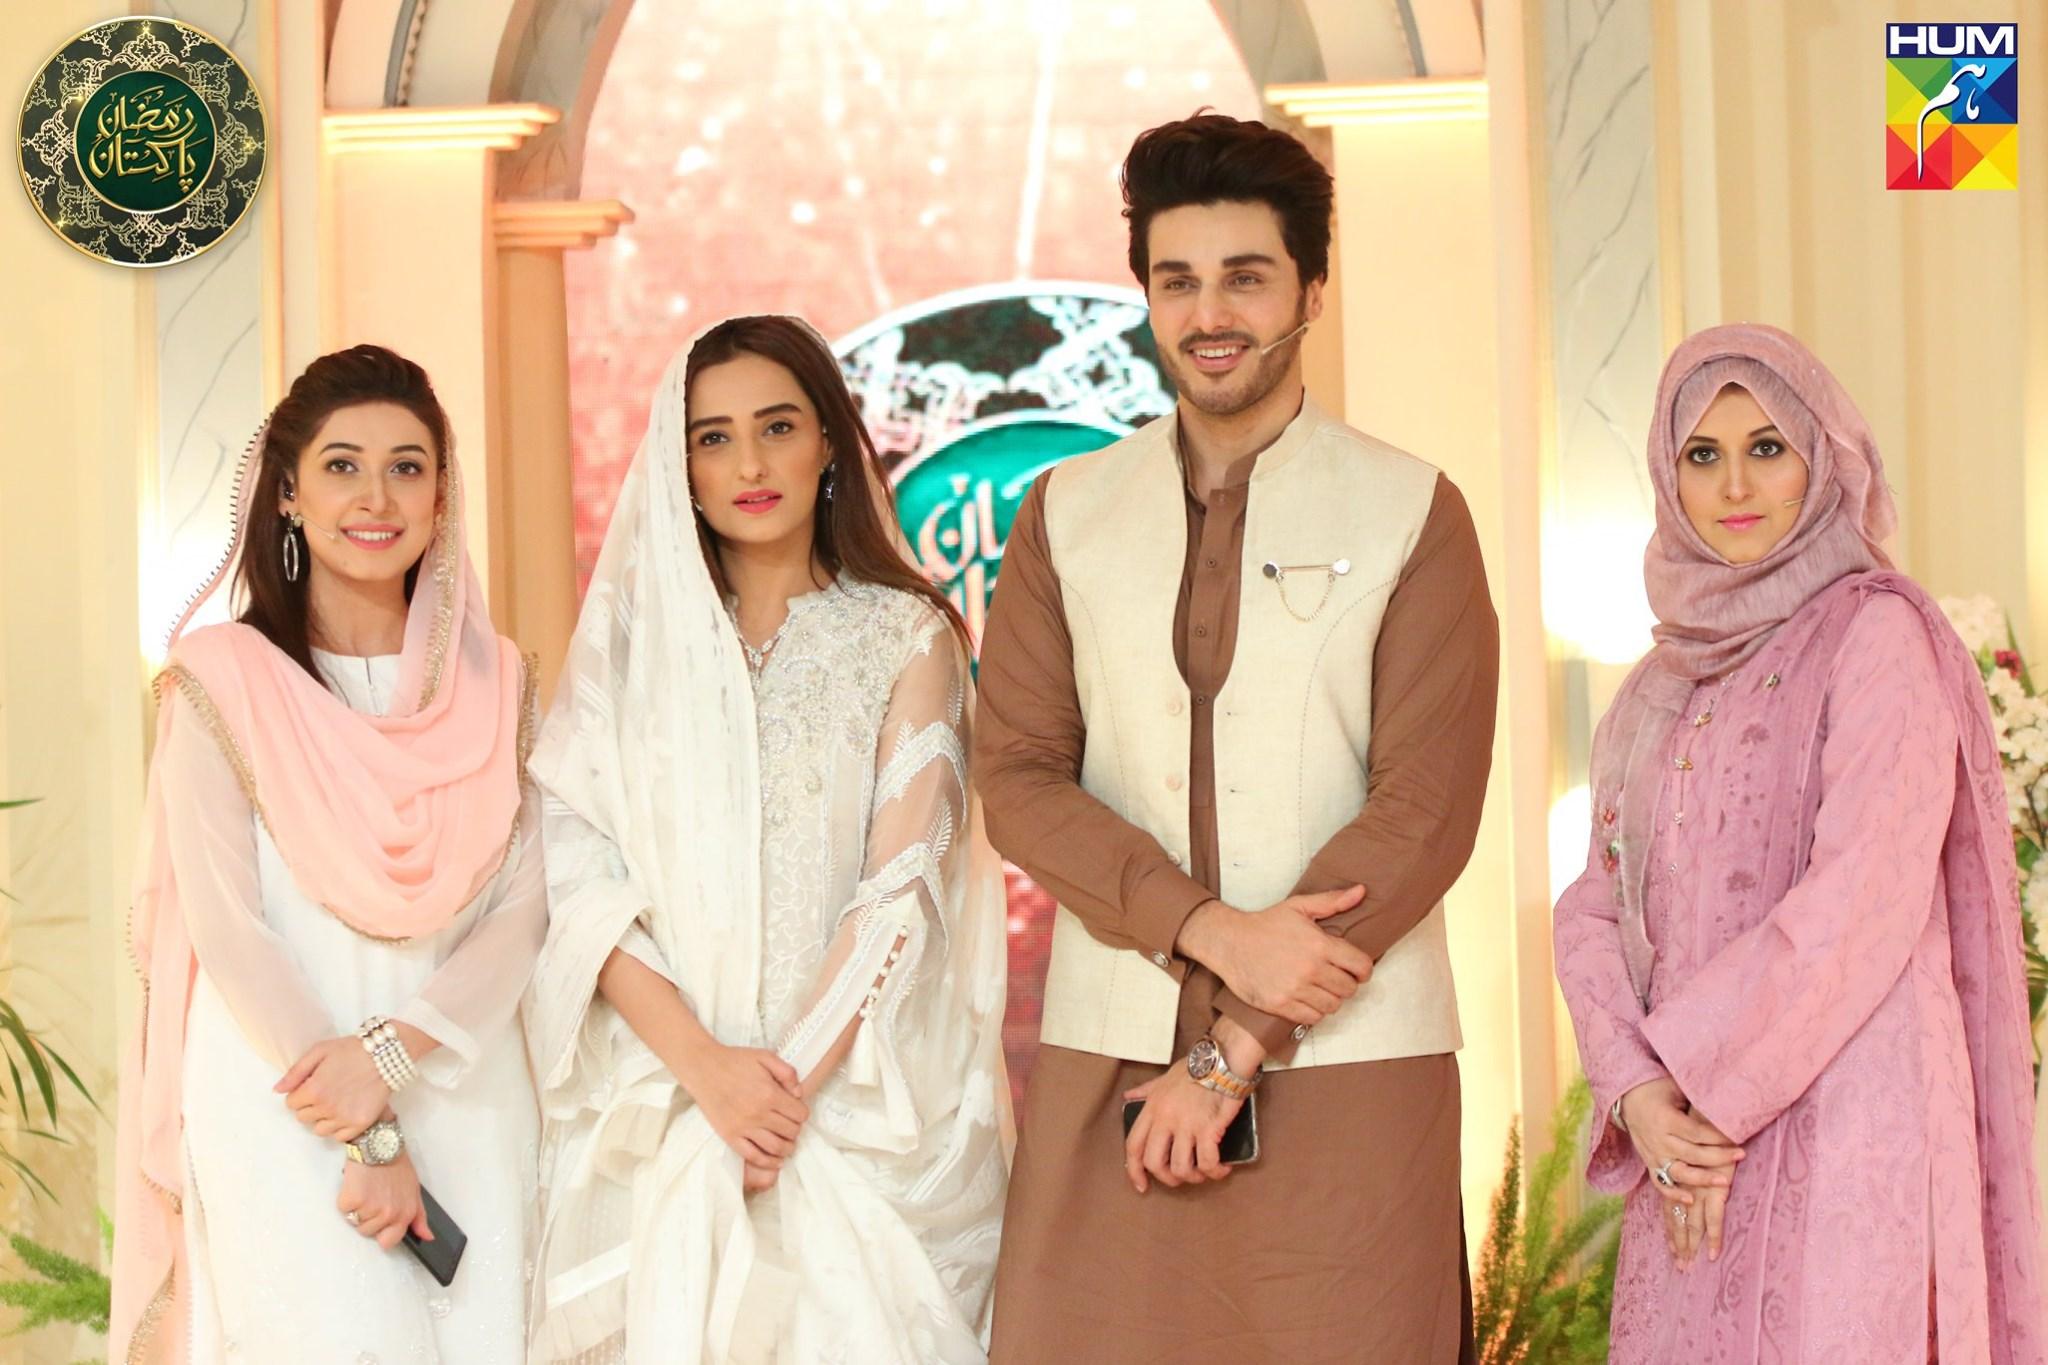 Beautiful Moomal Sheikh Appeared in Ramzan Pakistan Transmission